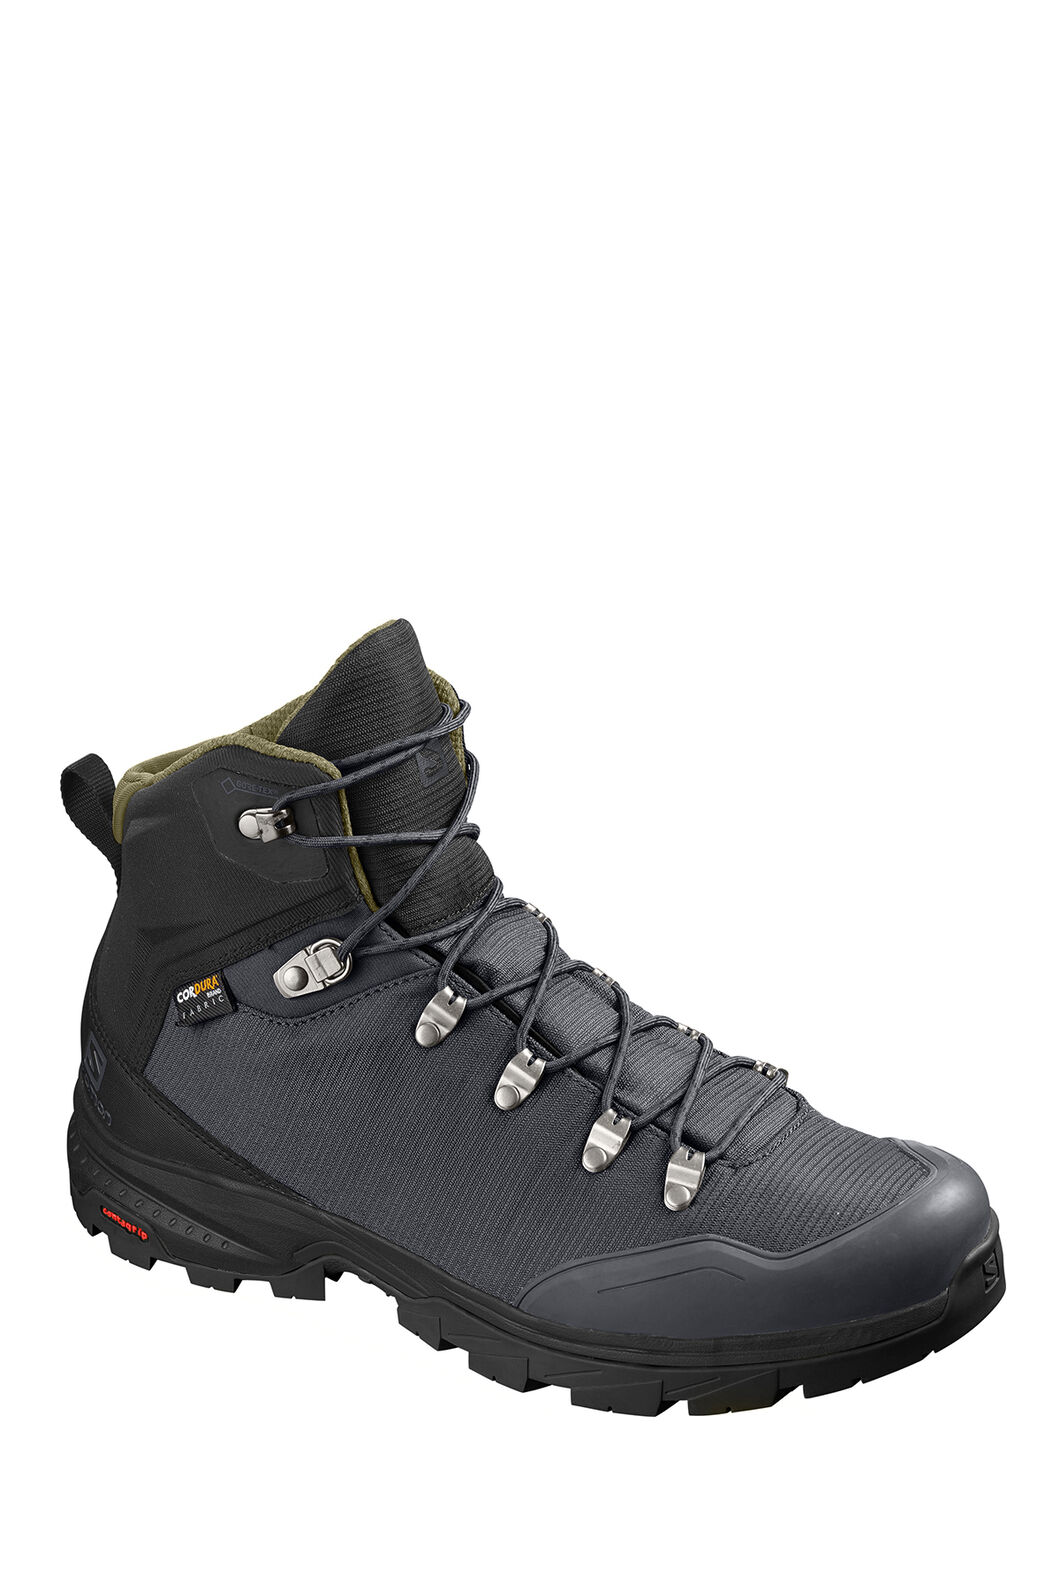 Salomon Outback 500 GTX WP Hiking Boots — Men's, Ebony/Black/Grape Leaf, hi-res